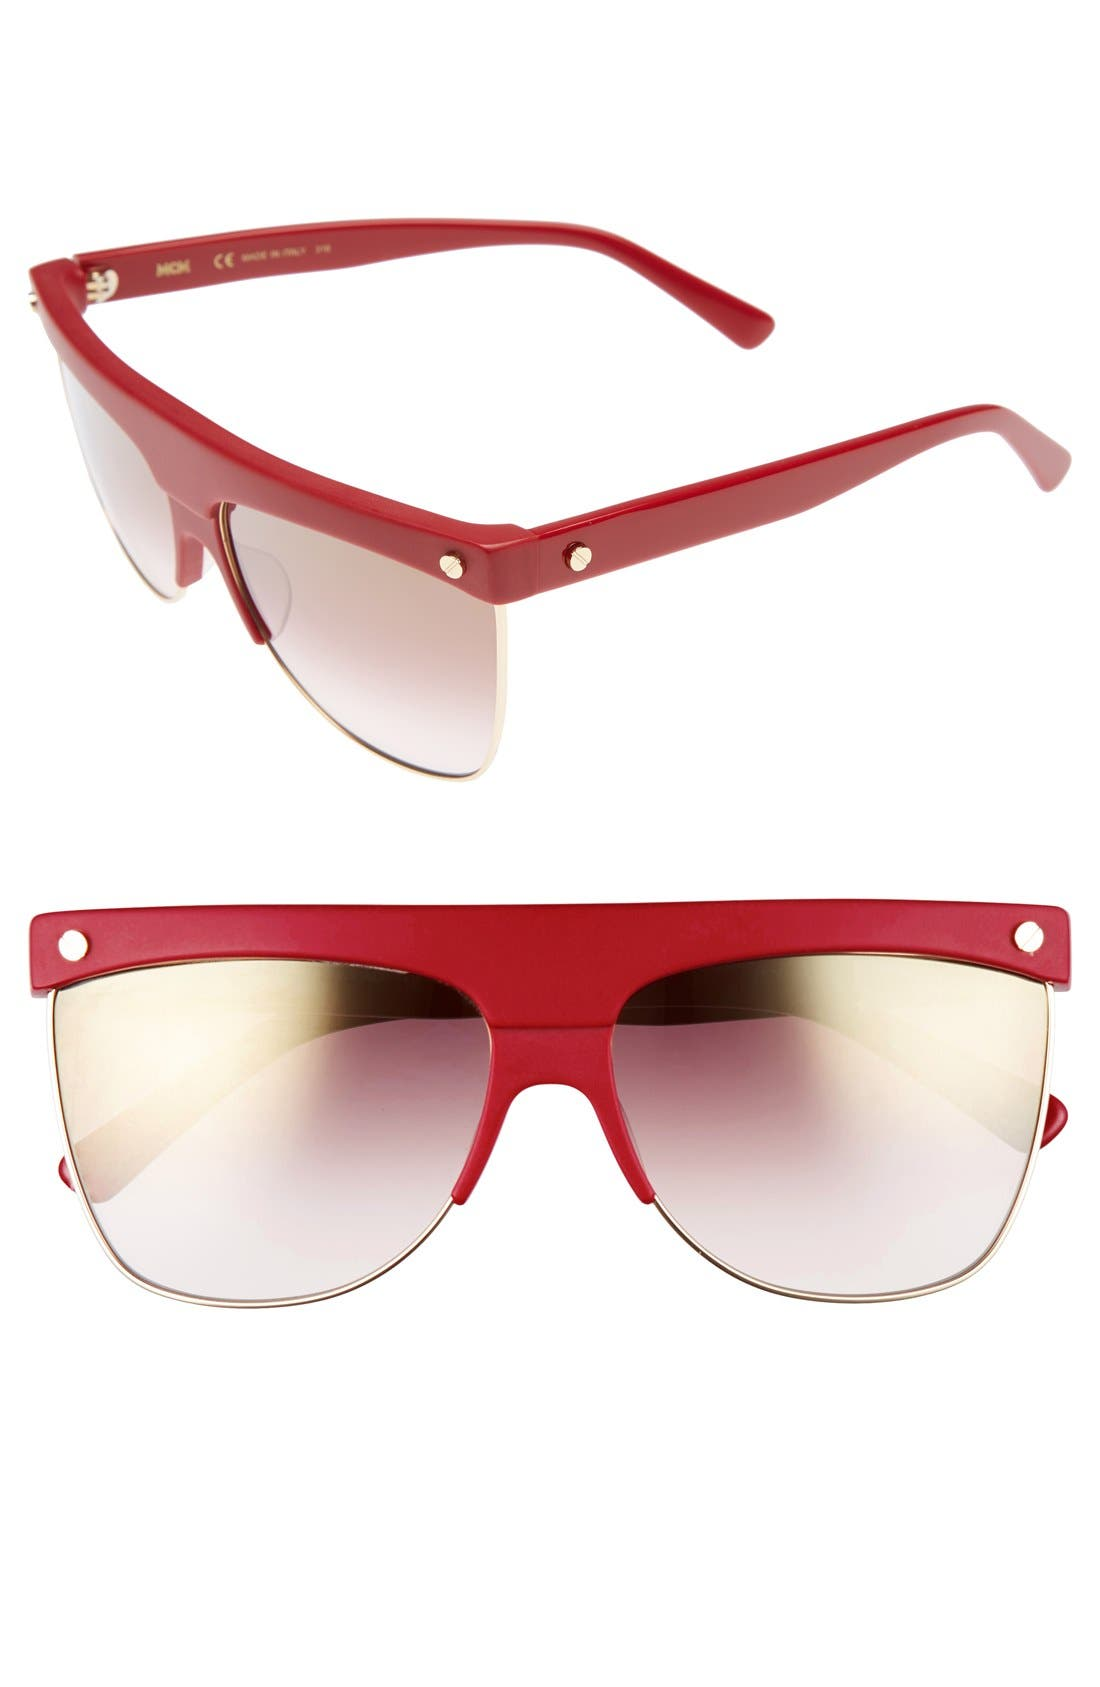 Main Image - MCM 60mm Aviator Sunglasses